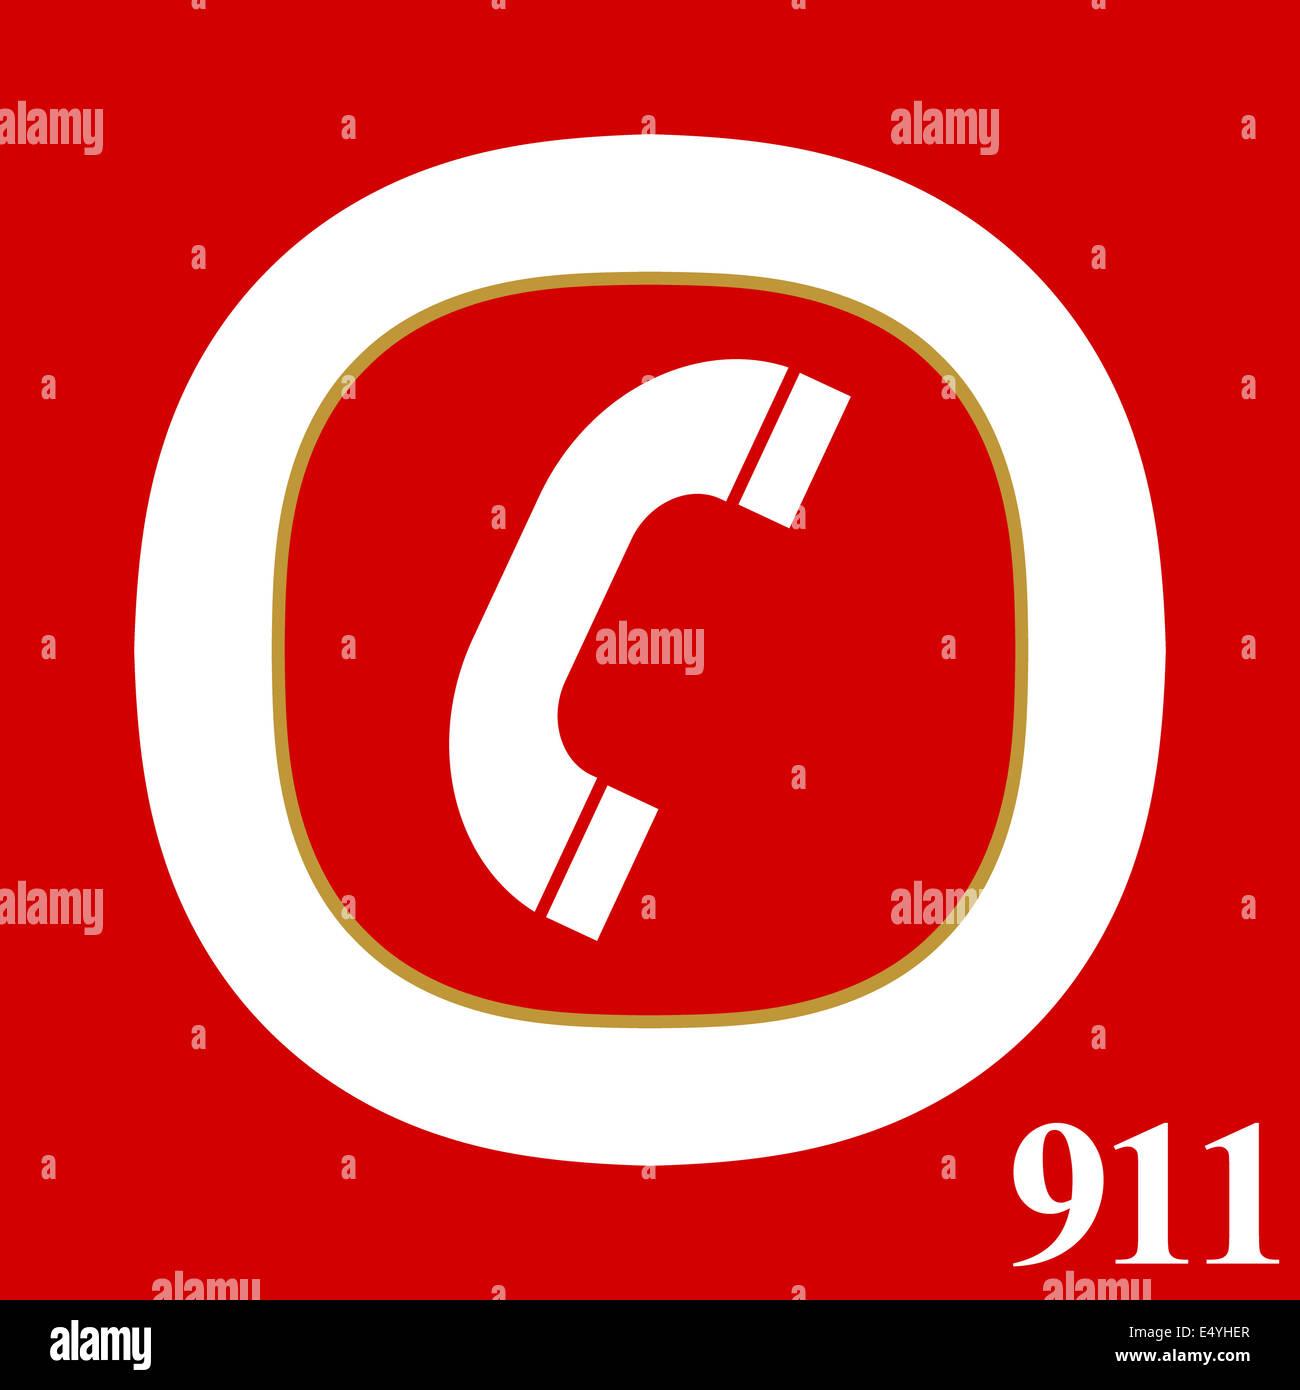 911 Emergency Logo Stock Photos & 911 Emergency Logo Stock